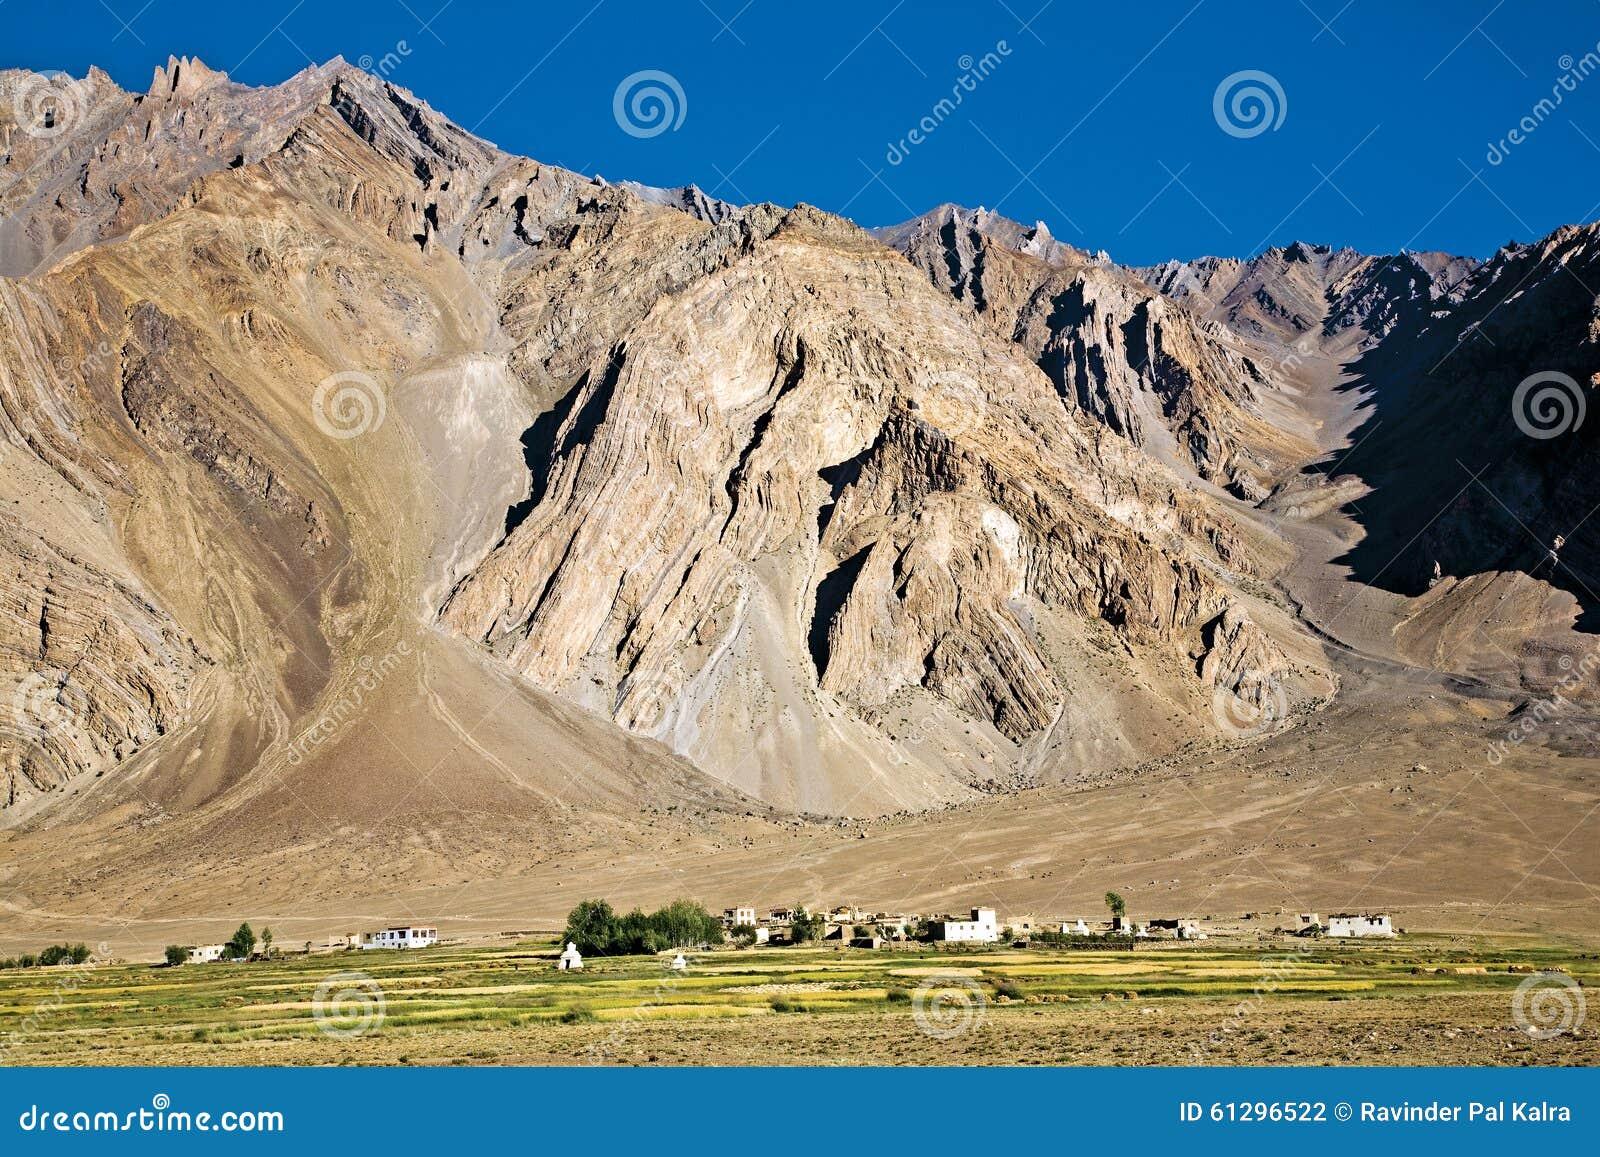 Un paisaje del pueblo de Zangla, valle de Zanskar, Padum, Ladakh, Jammu y Cachemira, la India